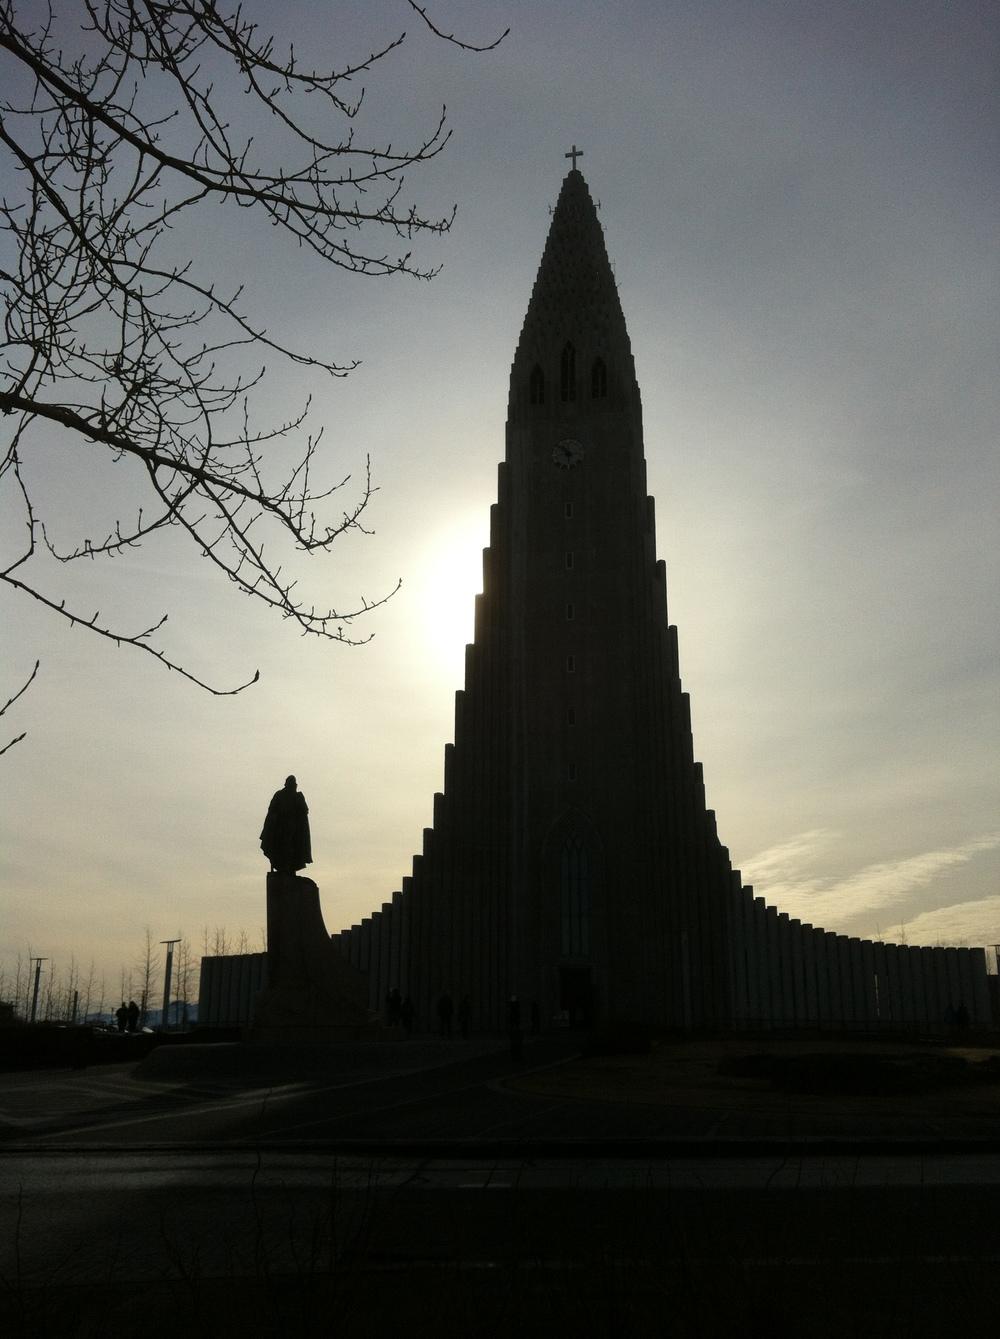 The Hallgrimskirkja Church, Reykjavik